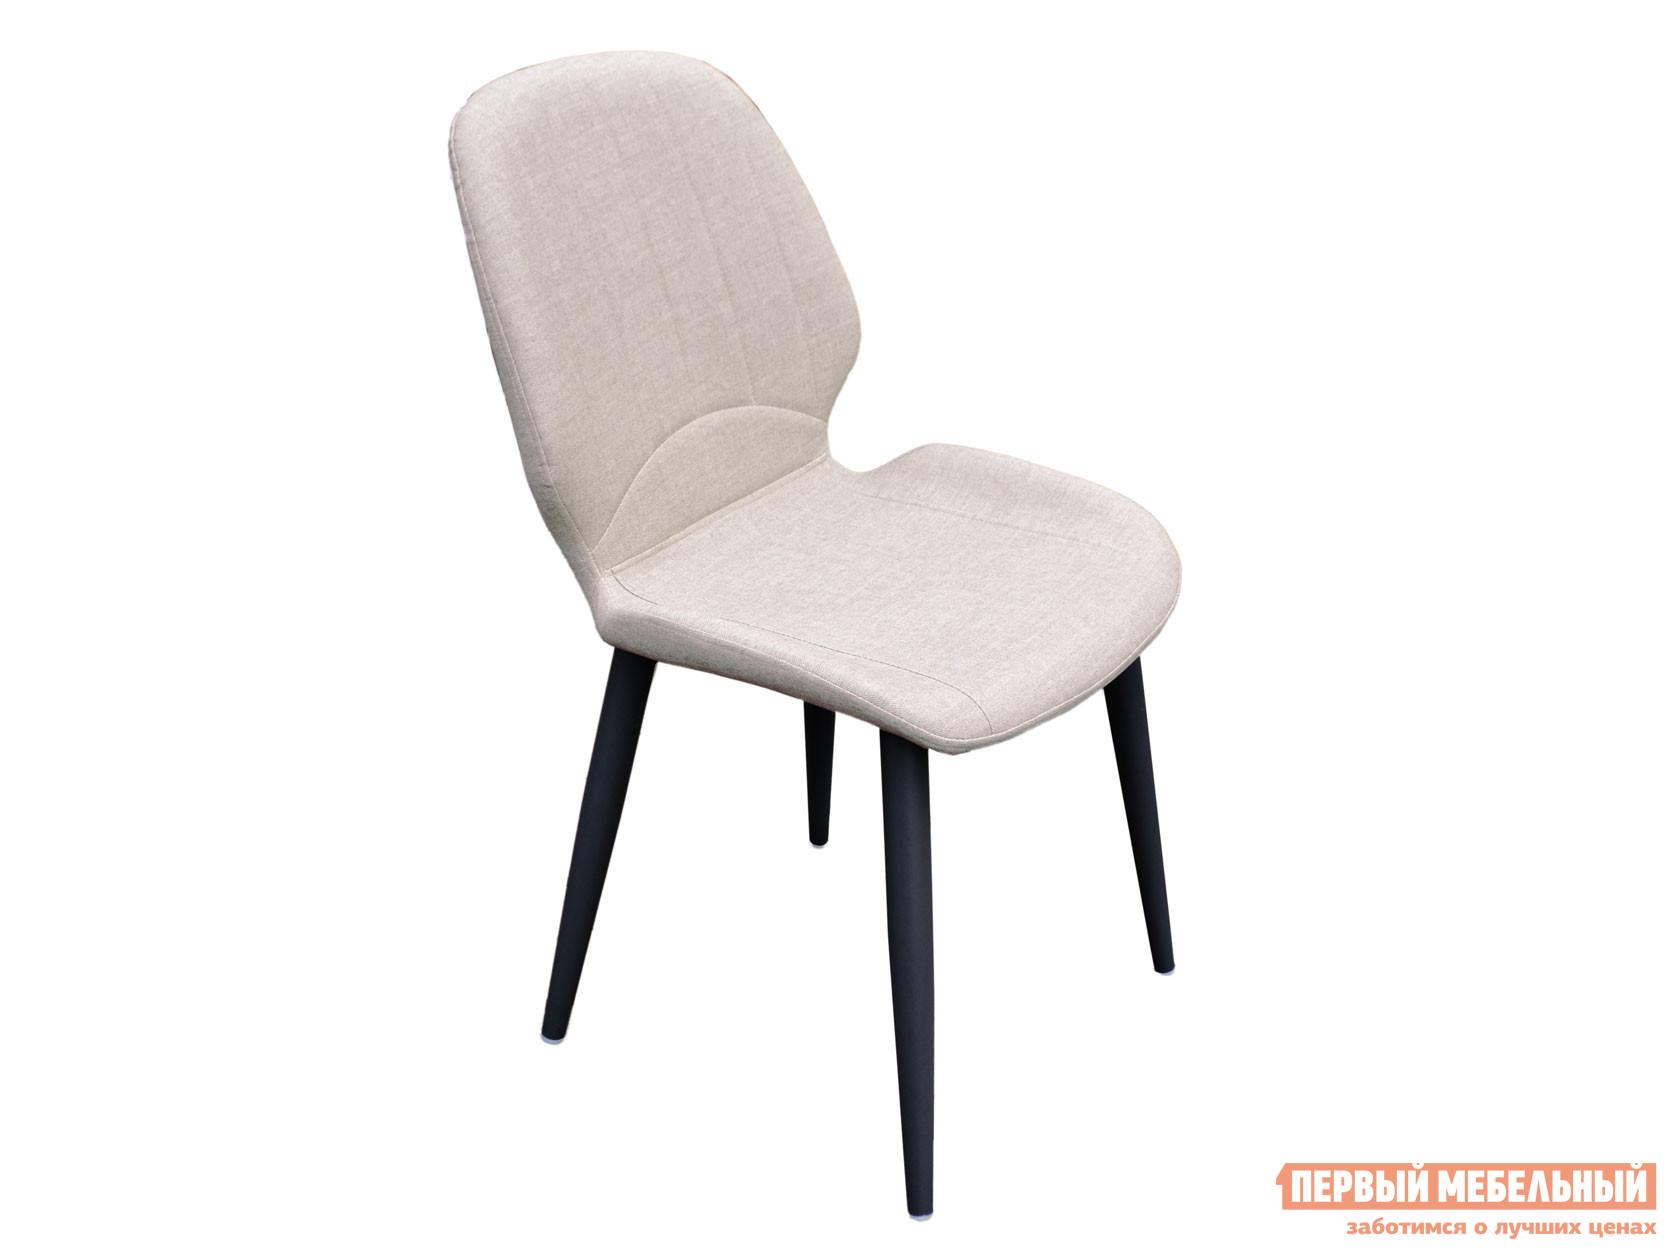 Стул Бел Мебельторг W-125 Кресло обеденное Оливер